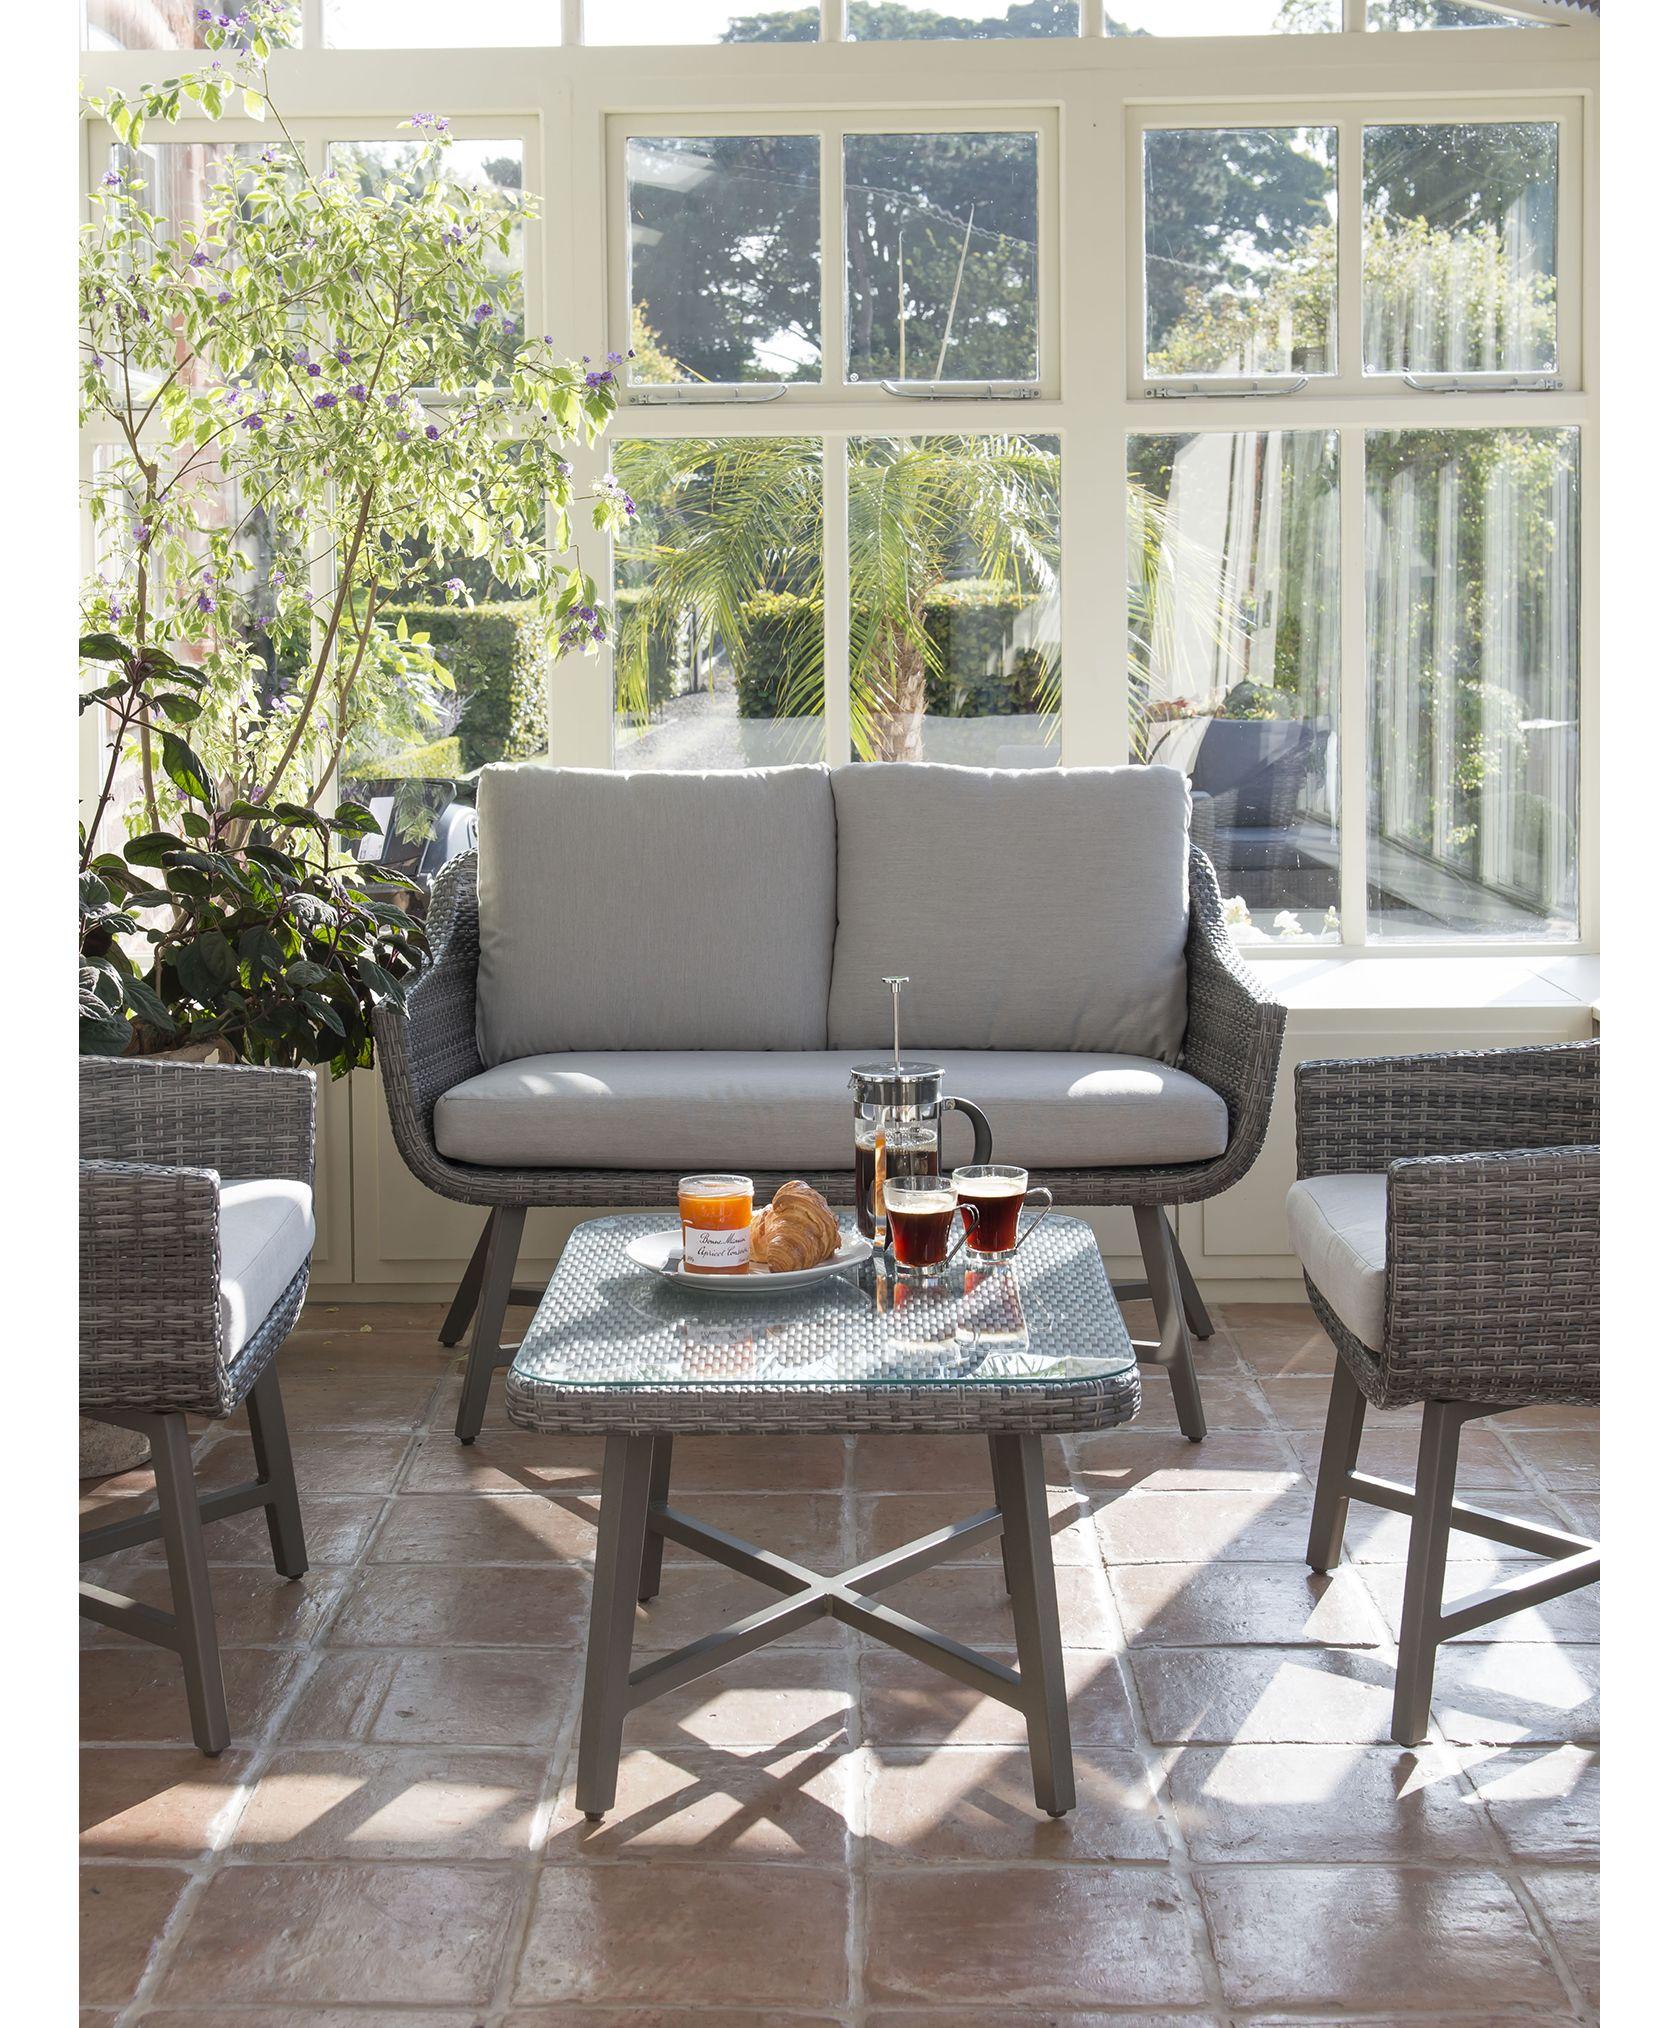 Kettler lamode outdoor furniture range